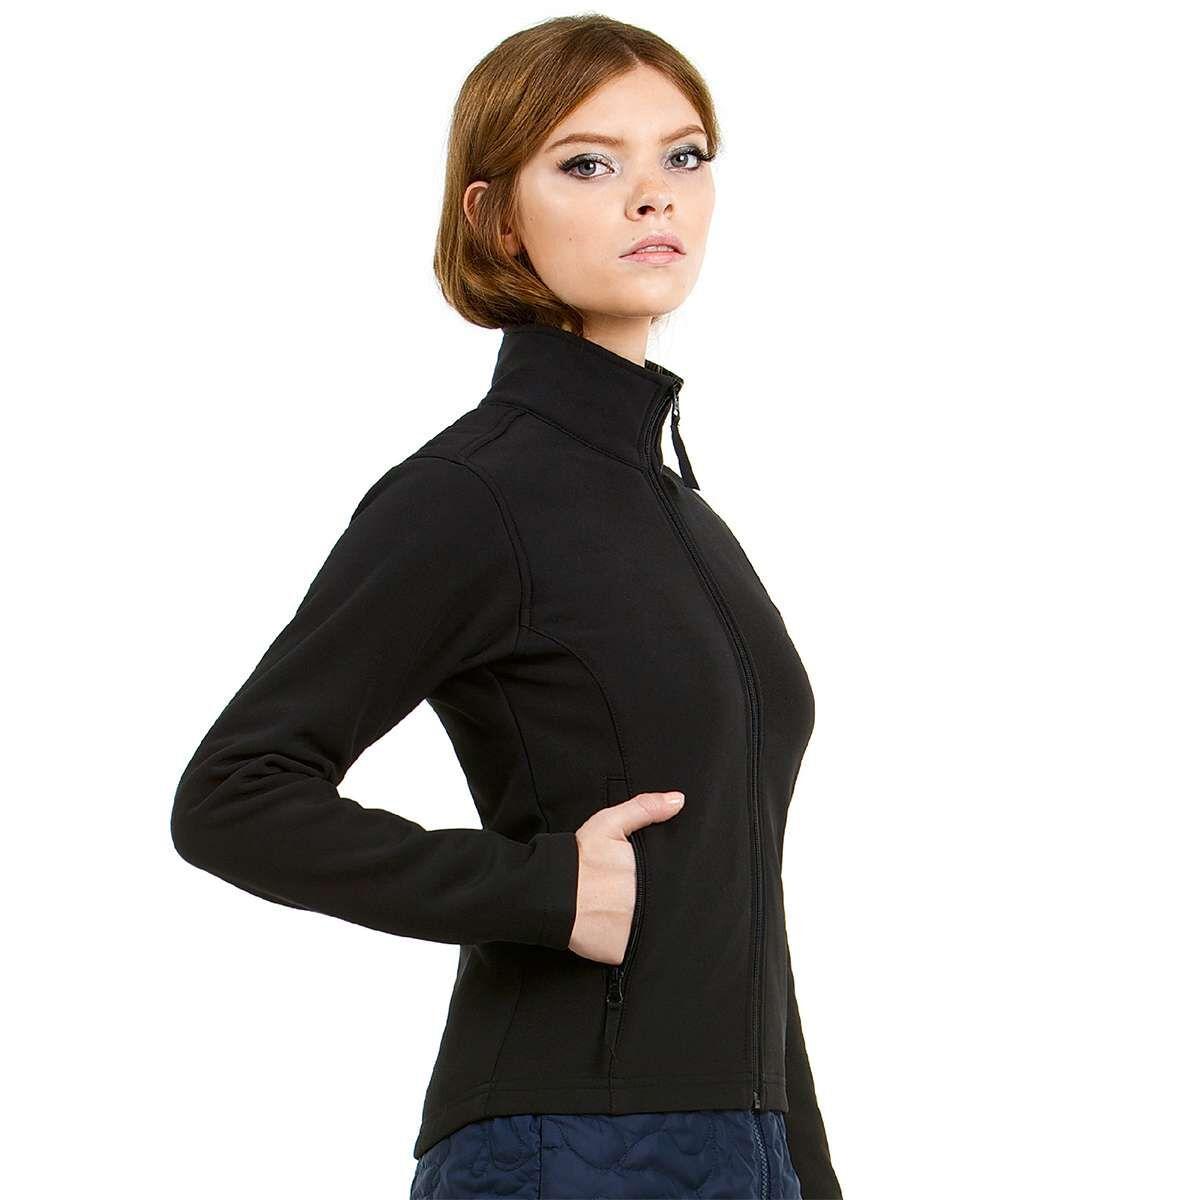 B&C Softshell Jacket Black